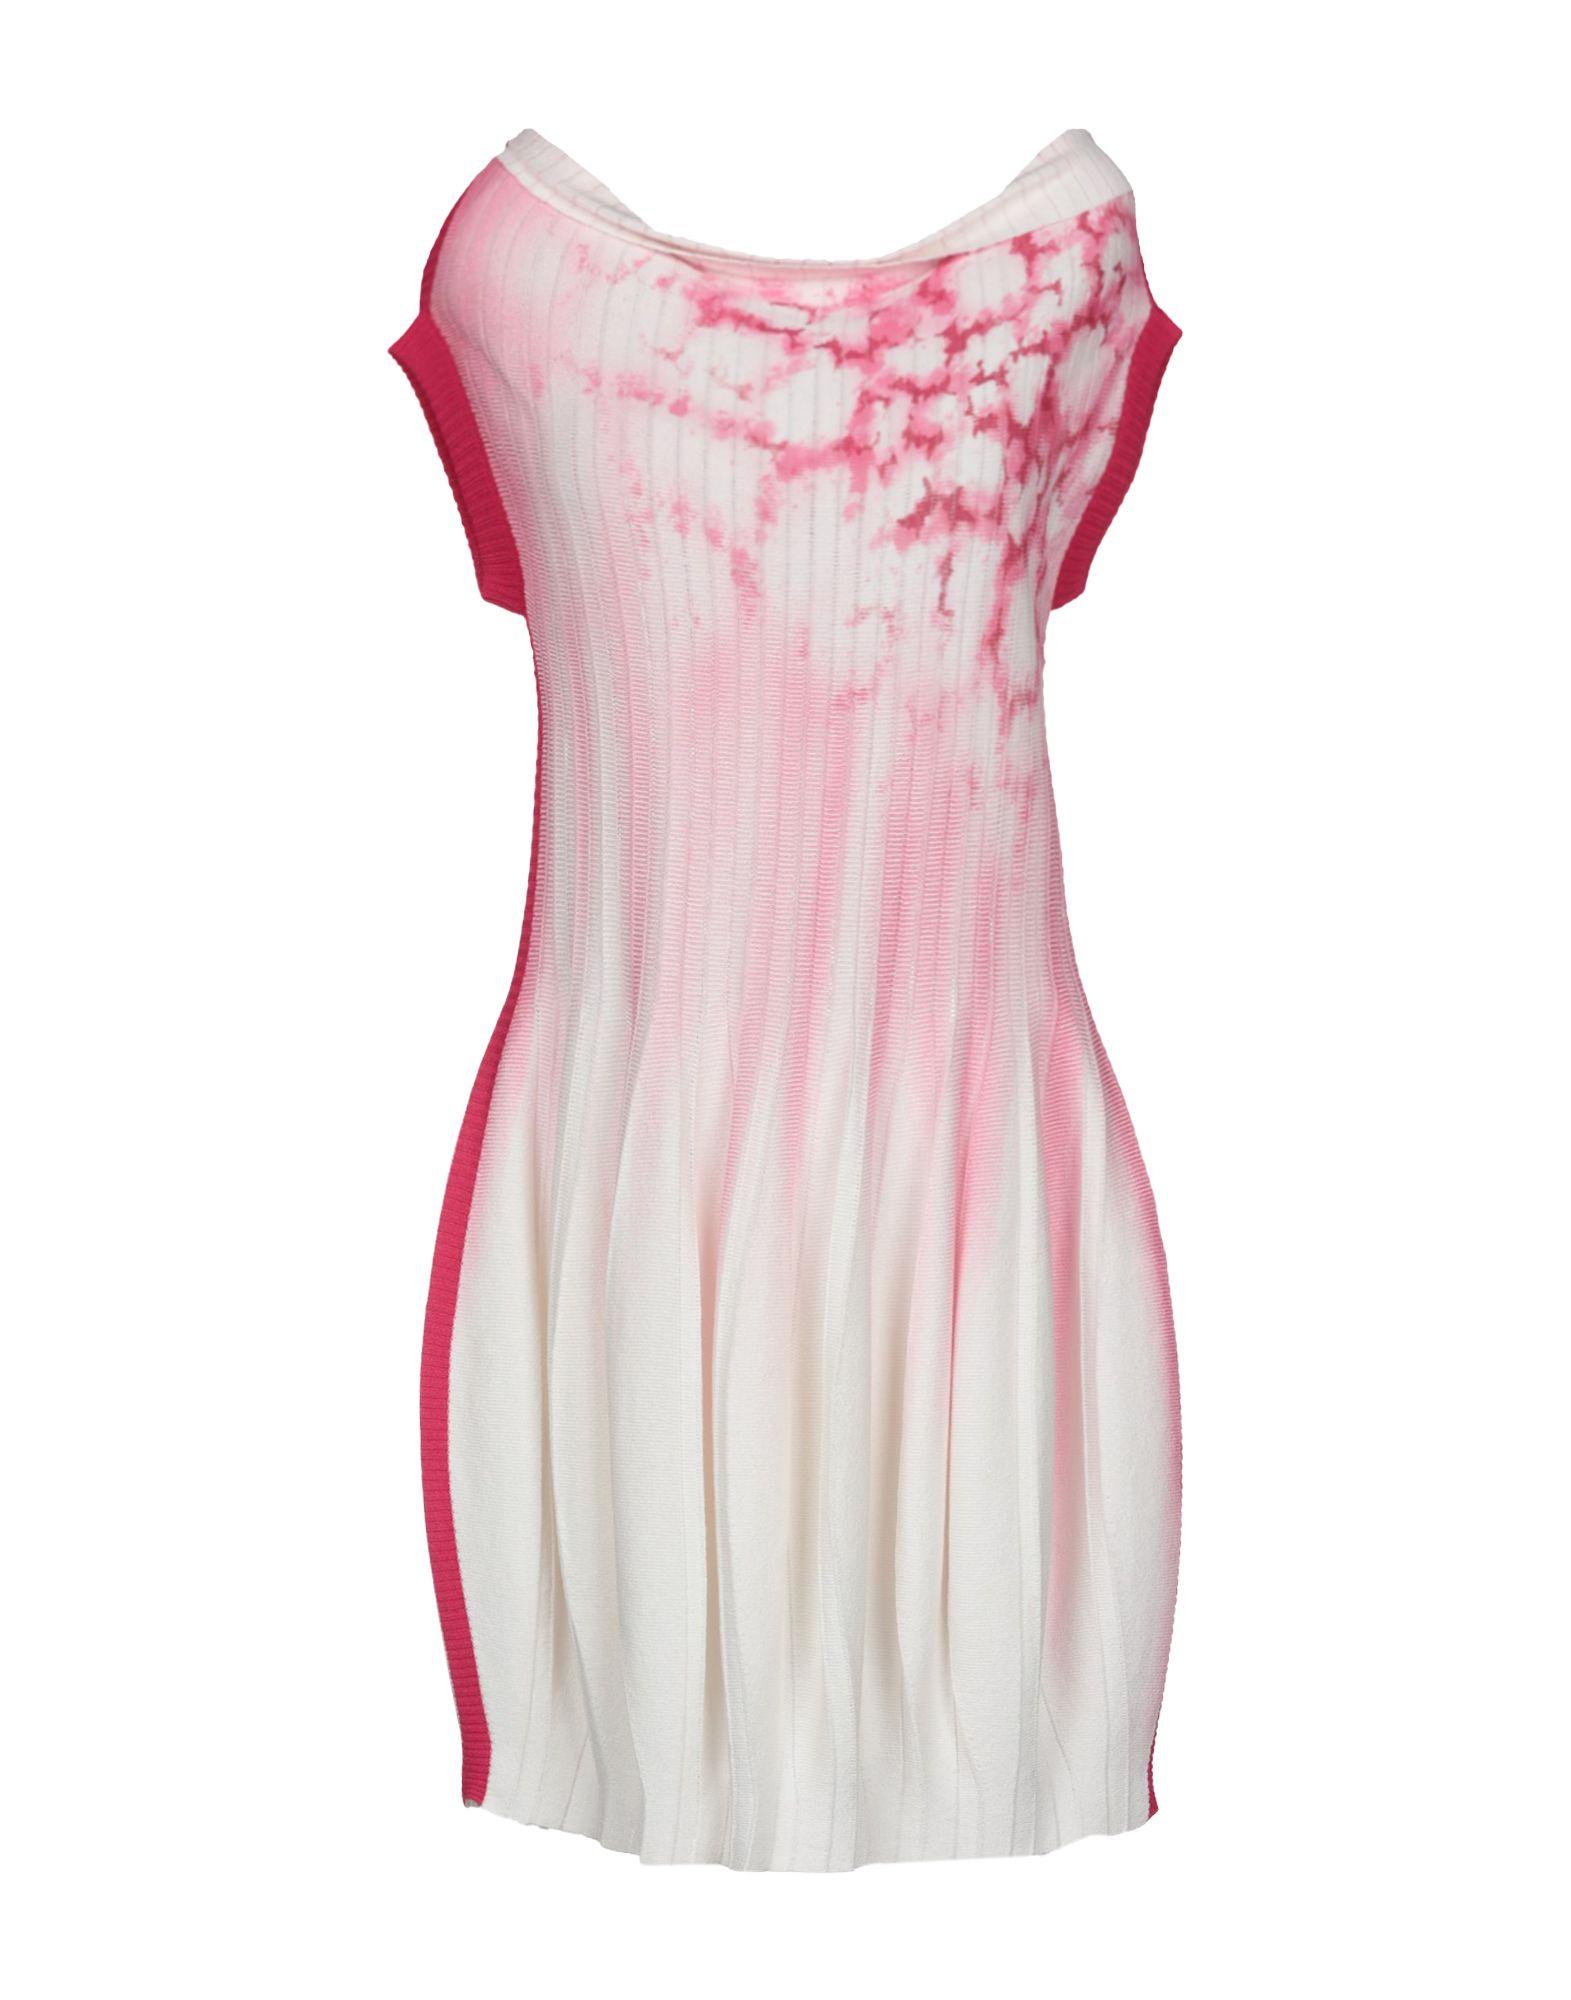 ORIGAMI KNITWEAR by PATRIZIA FERRETTI Короткое платье платье quelle patrizia dini by heine 19109050